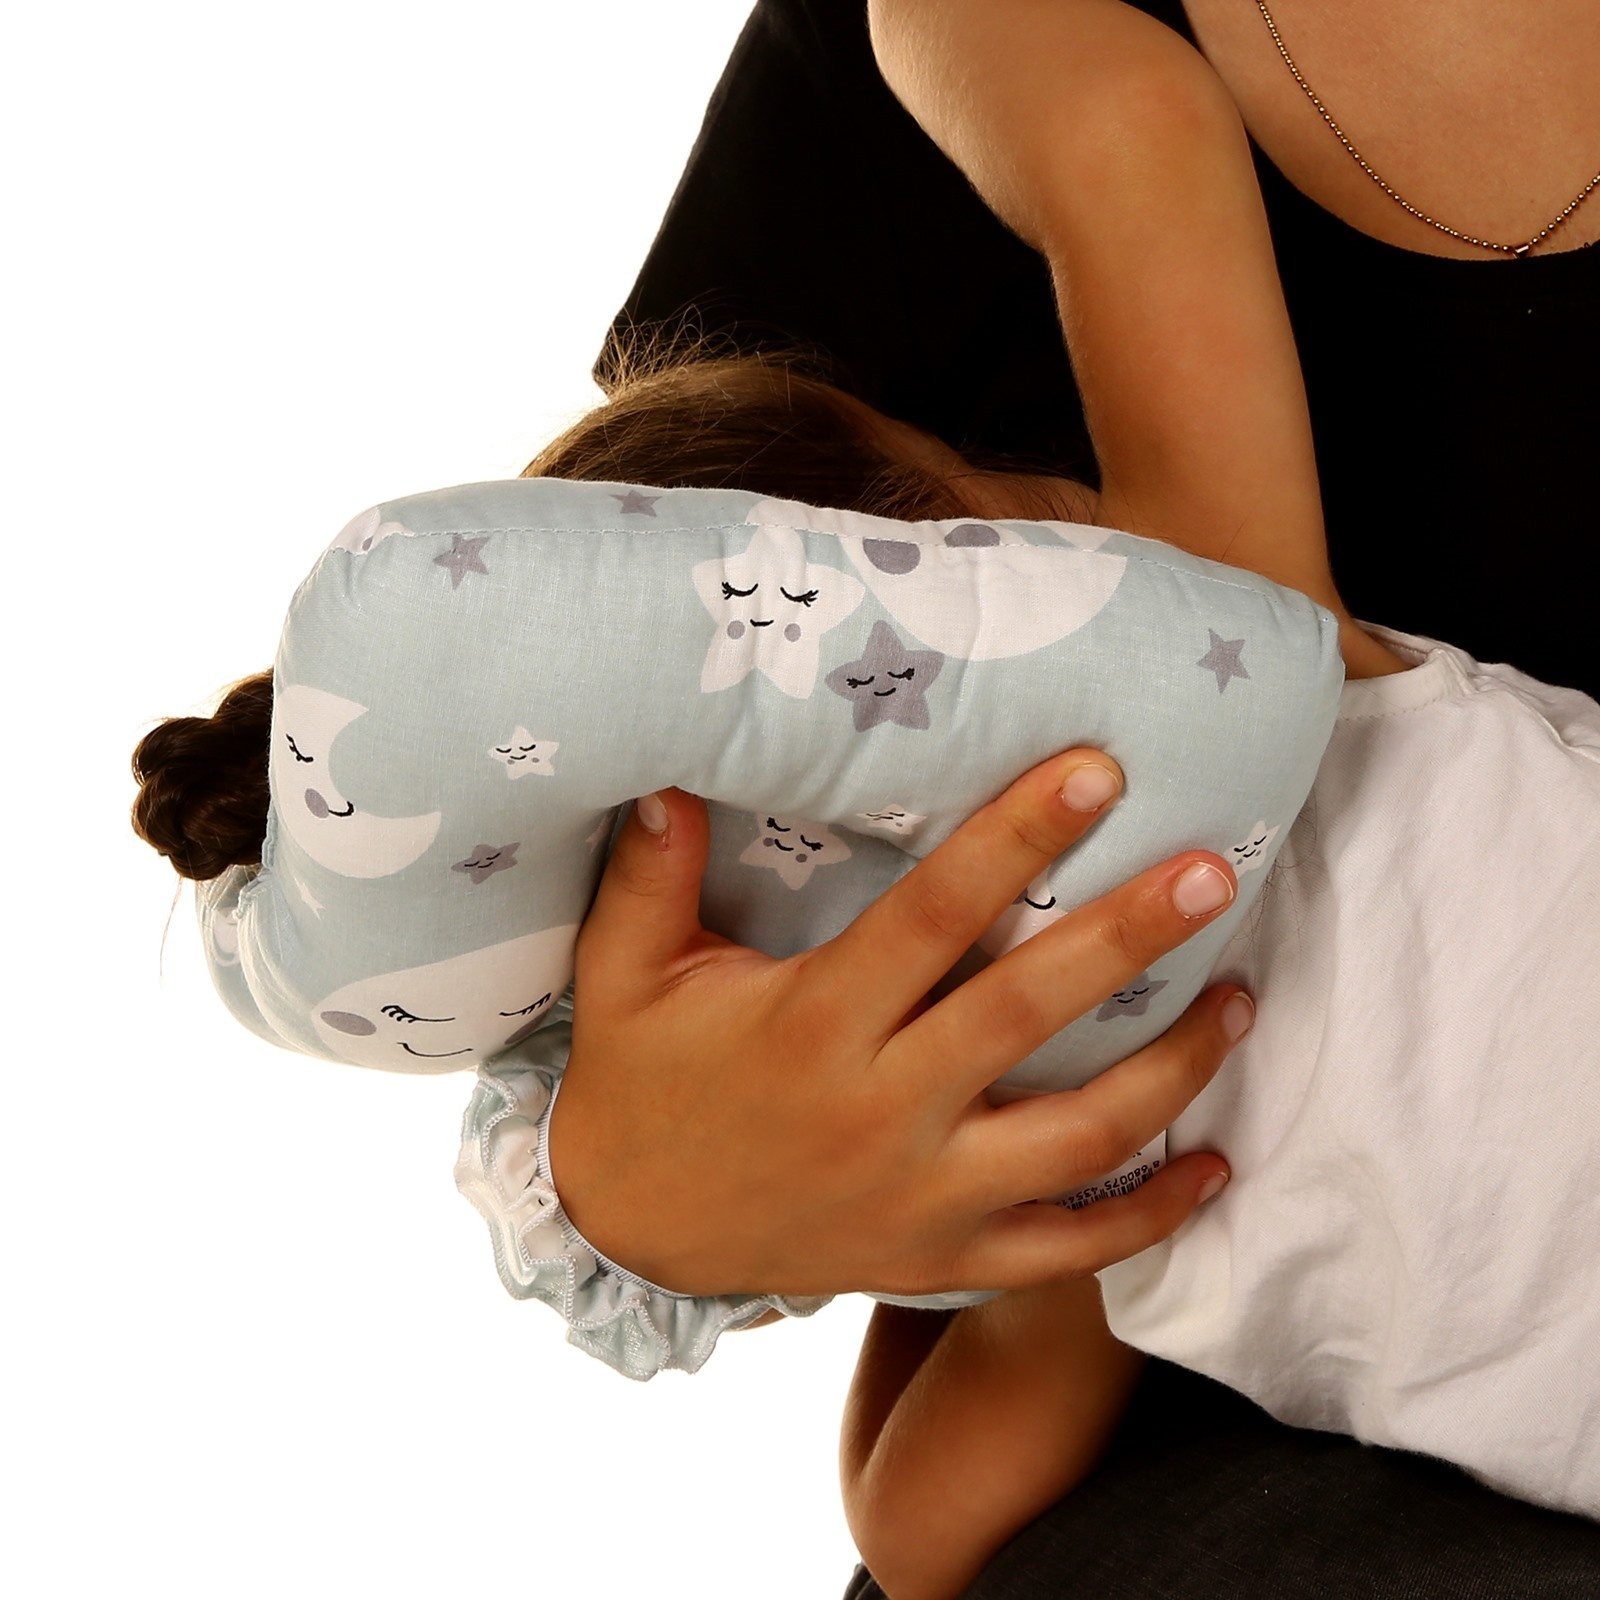 Ebebek Baby&plus Mini Nursing Pillow Sky Patterned Cotton 0 Month+